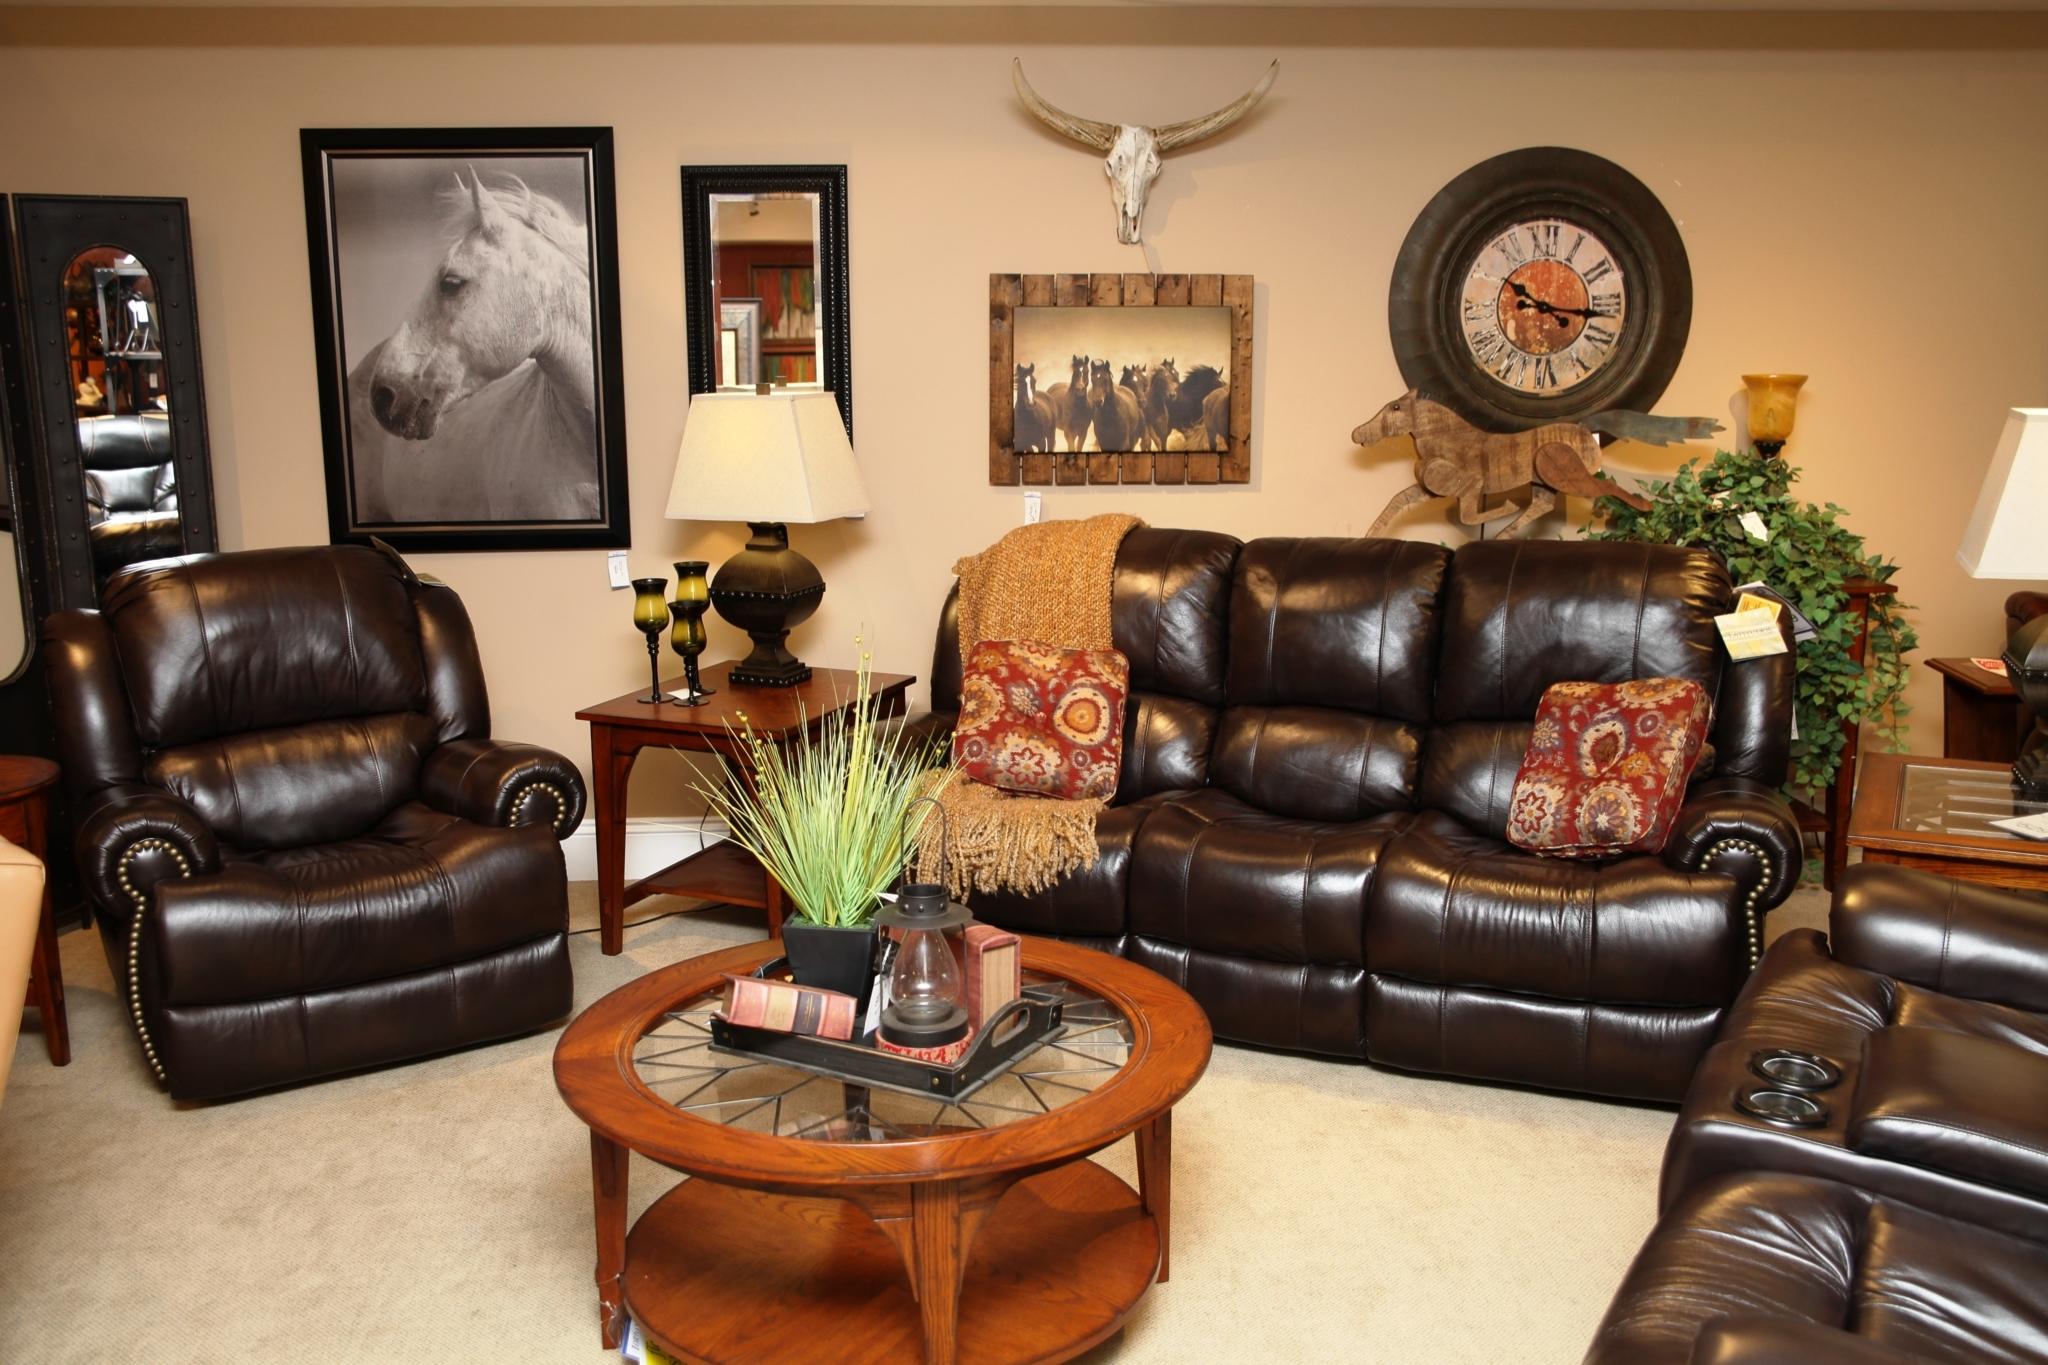 Jordan 39 s home furnishings ltd new minas ns ourbis Xinlan home furniture limited